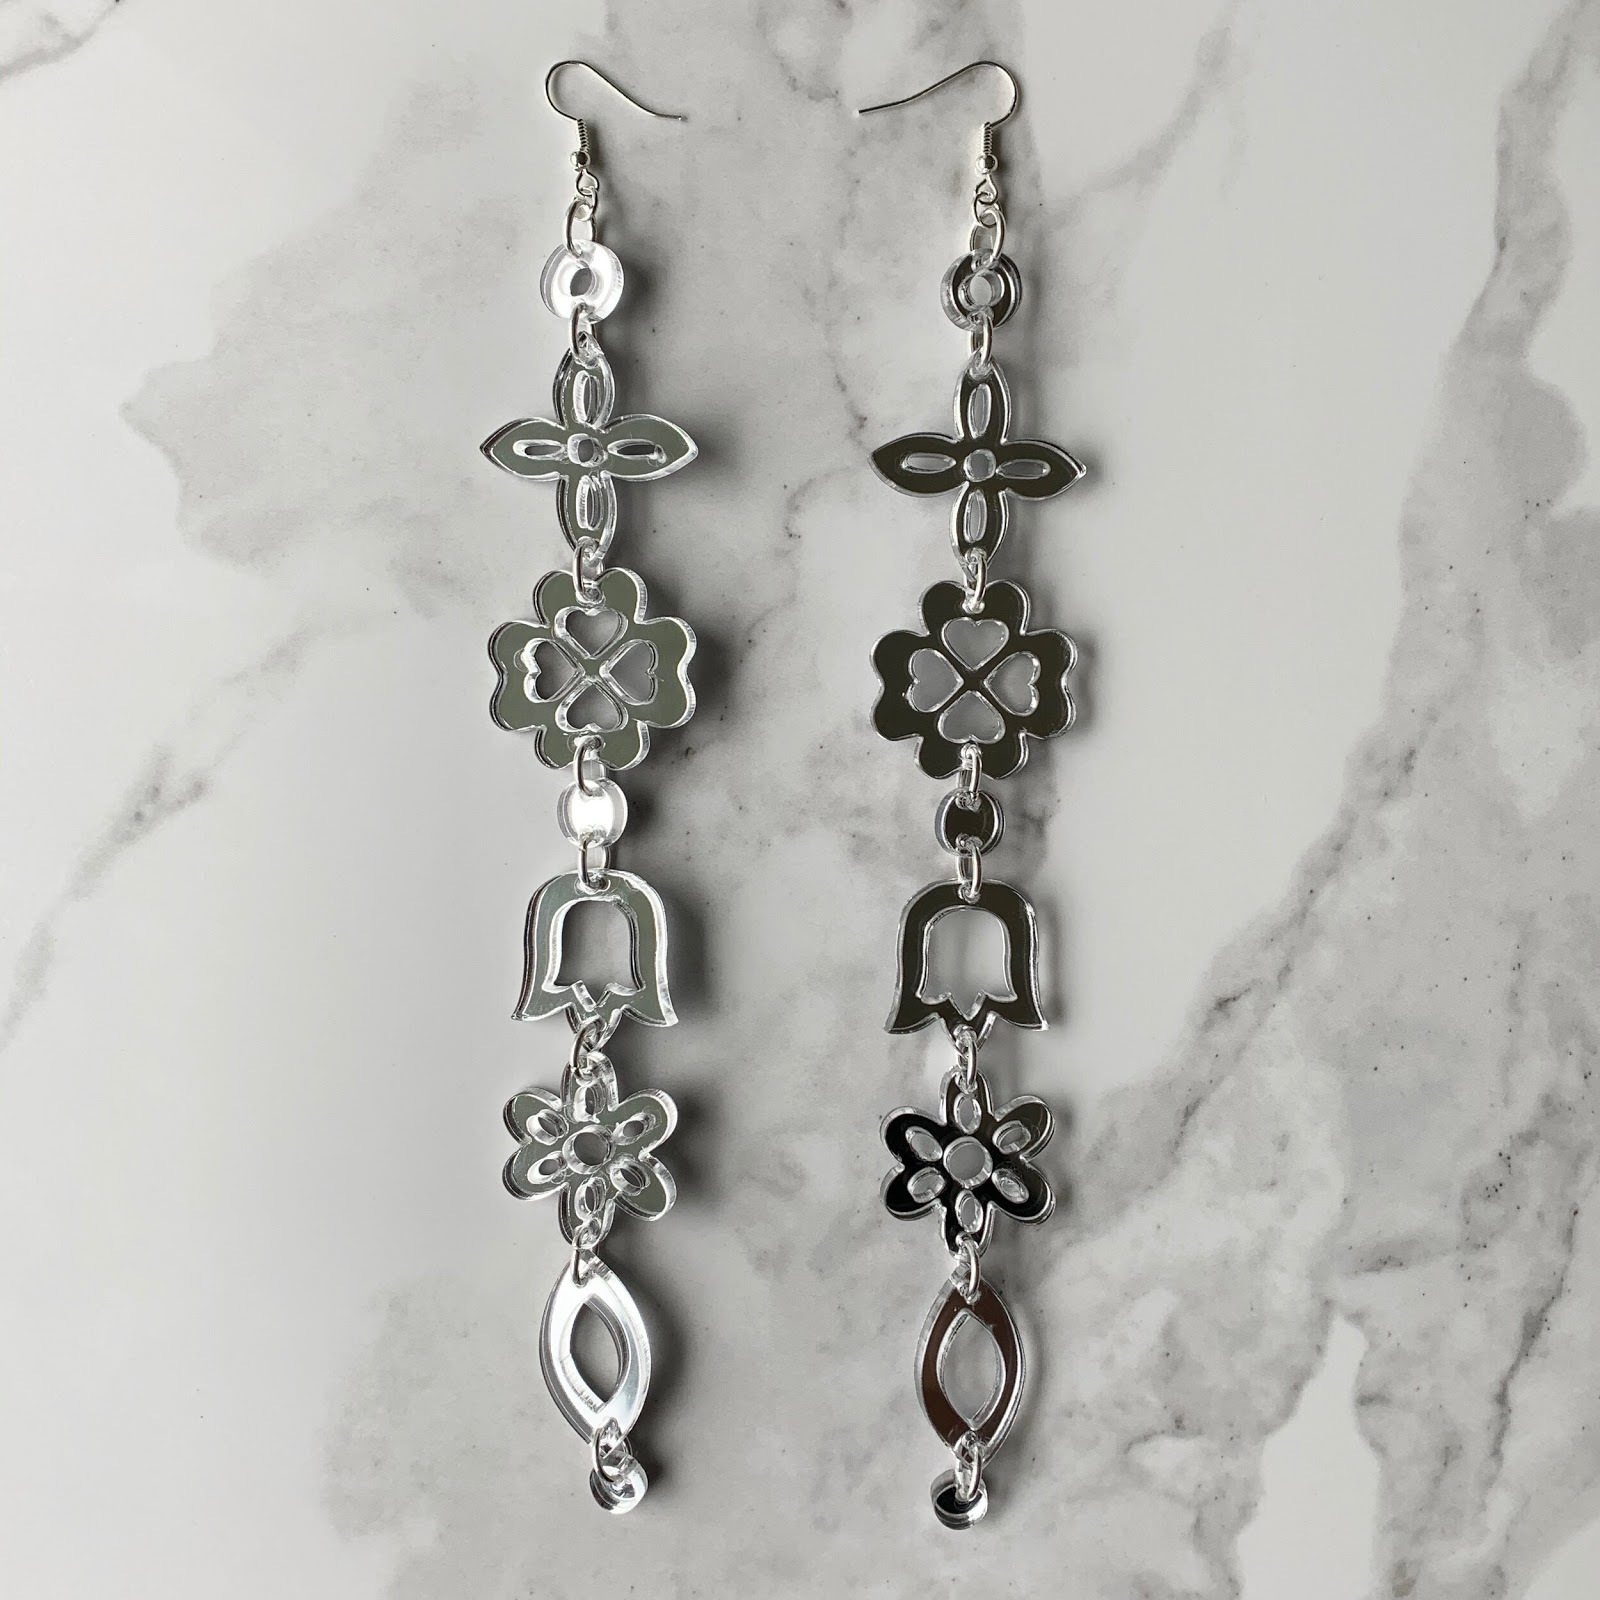 Indi City Earrings